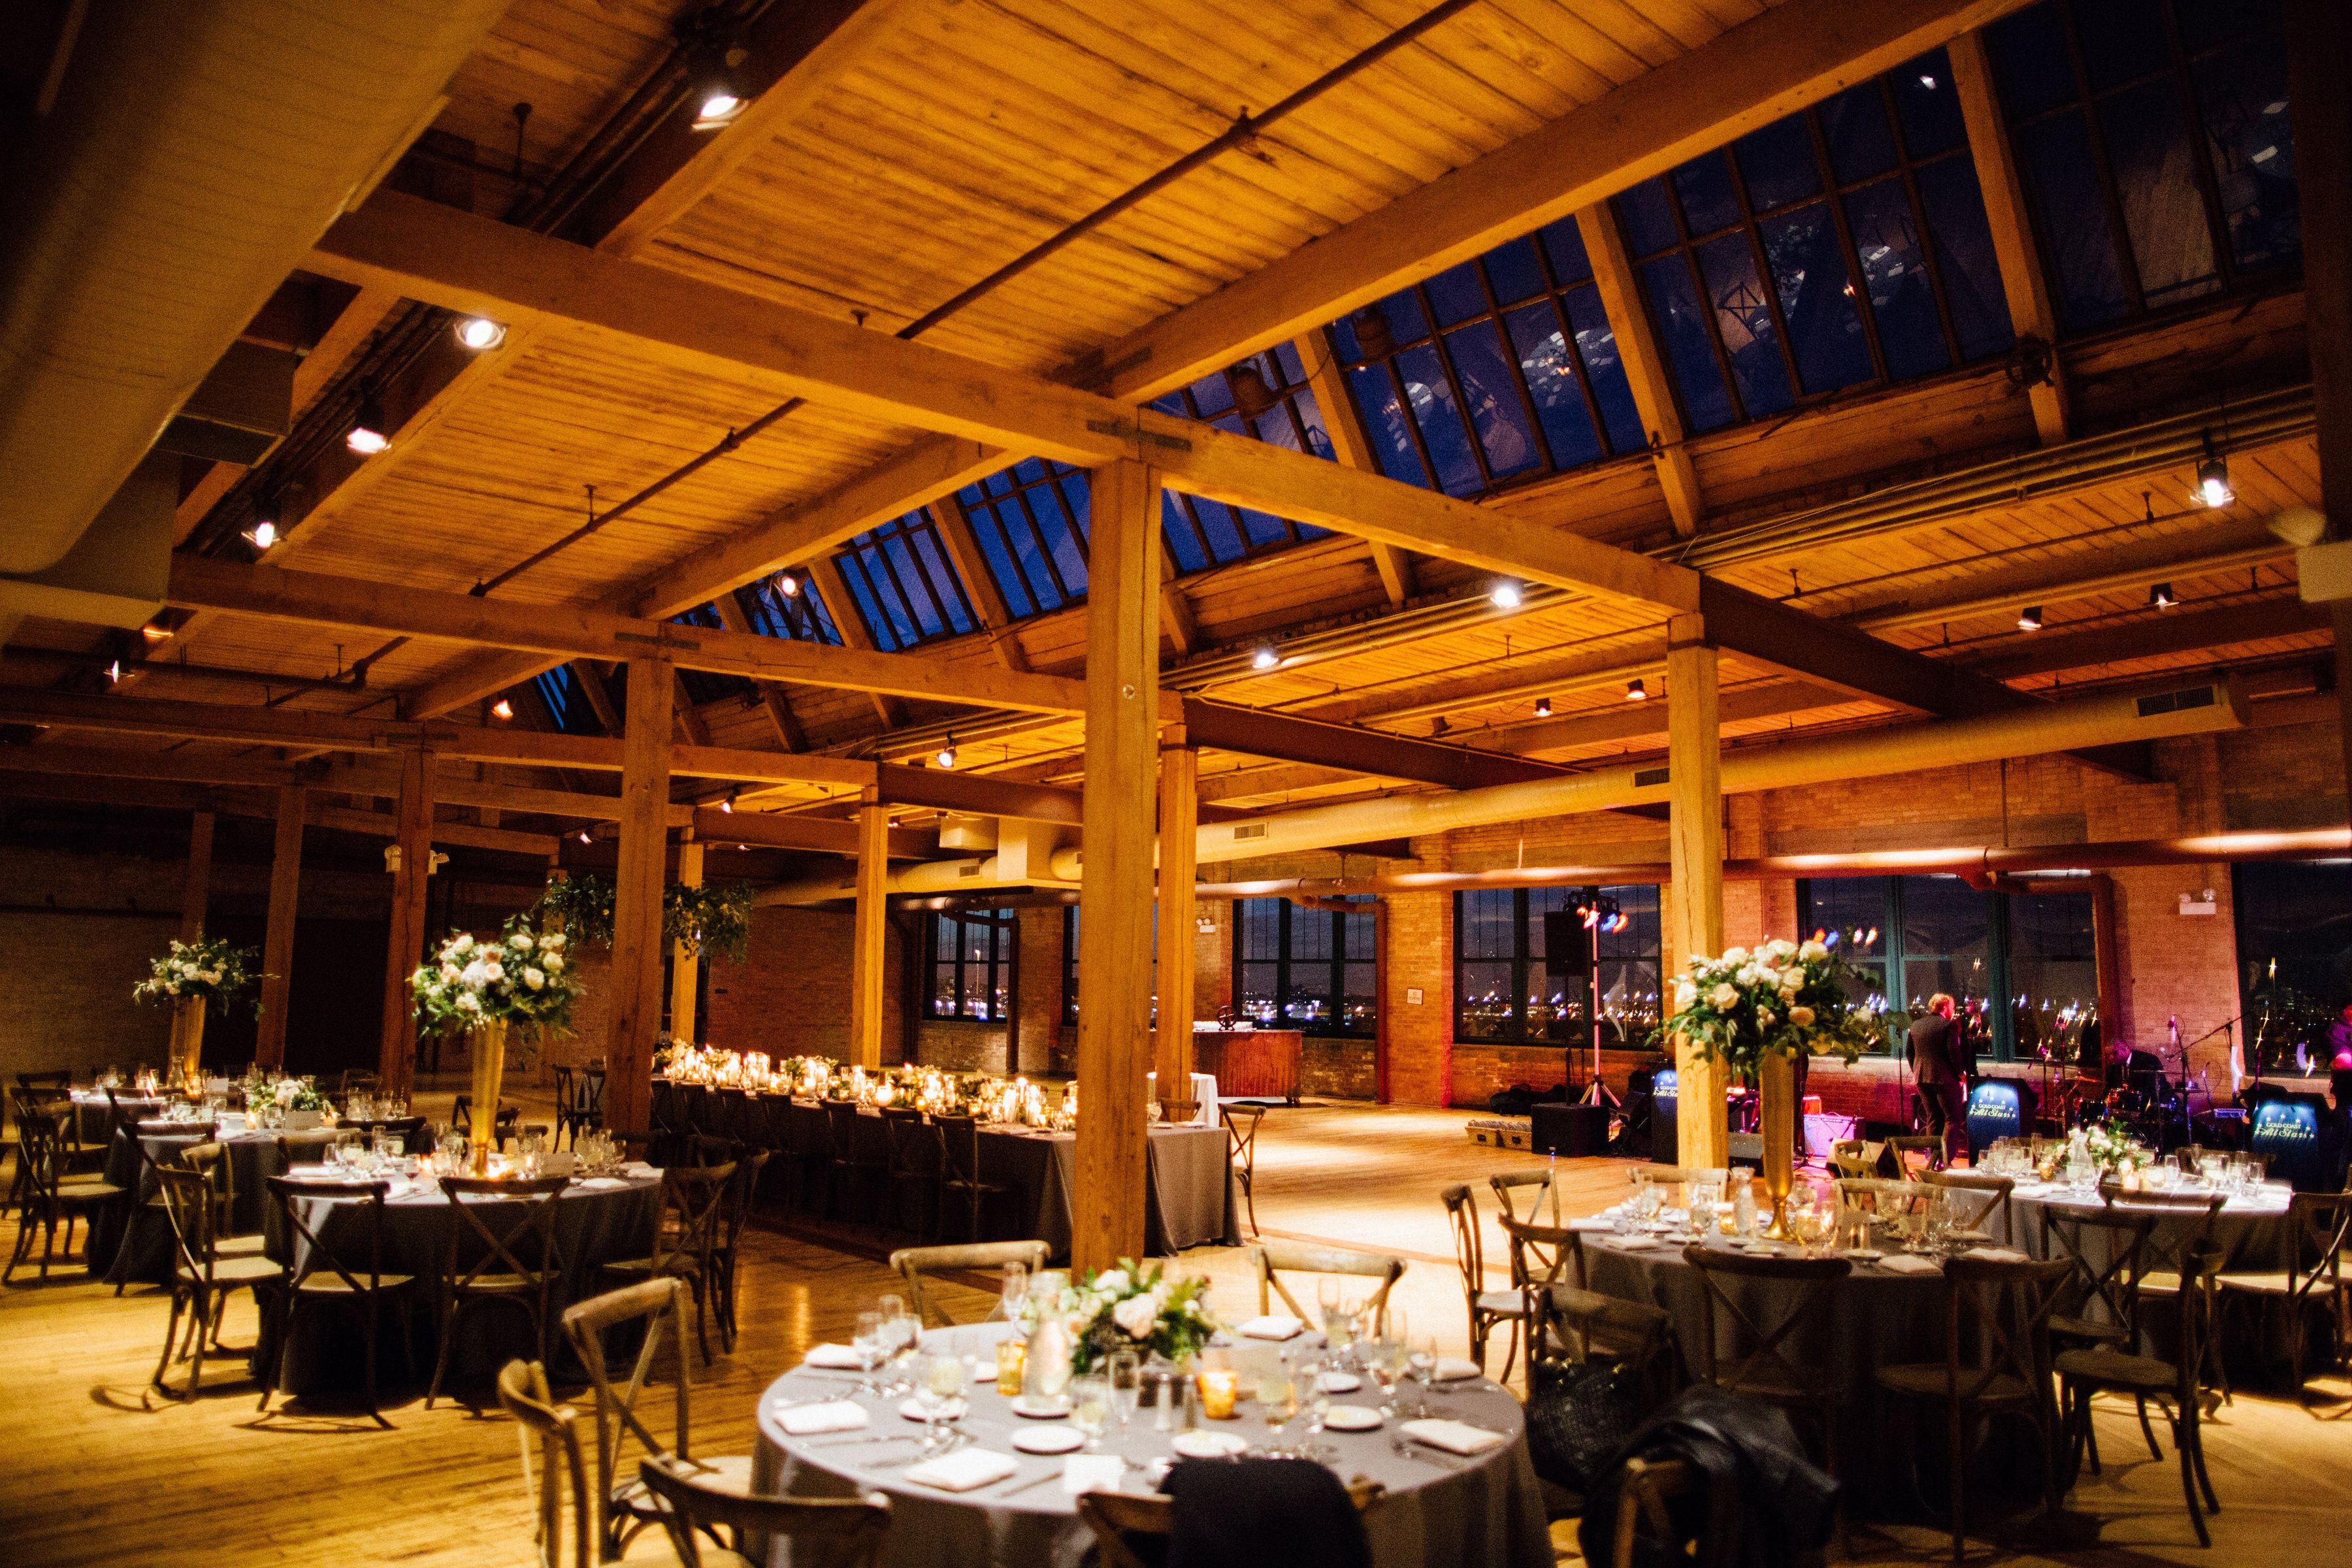 Flowers By Pollen Photography By Tim Tab Studios Bridgeport Art Center Skyline Loft Wedding Bridgeport Art Center Candles Photography Loft Wedding Reception